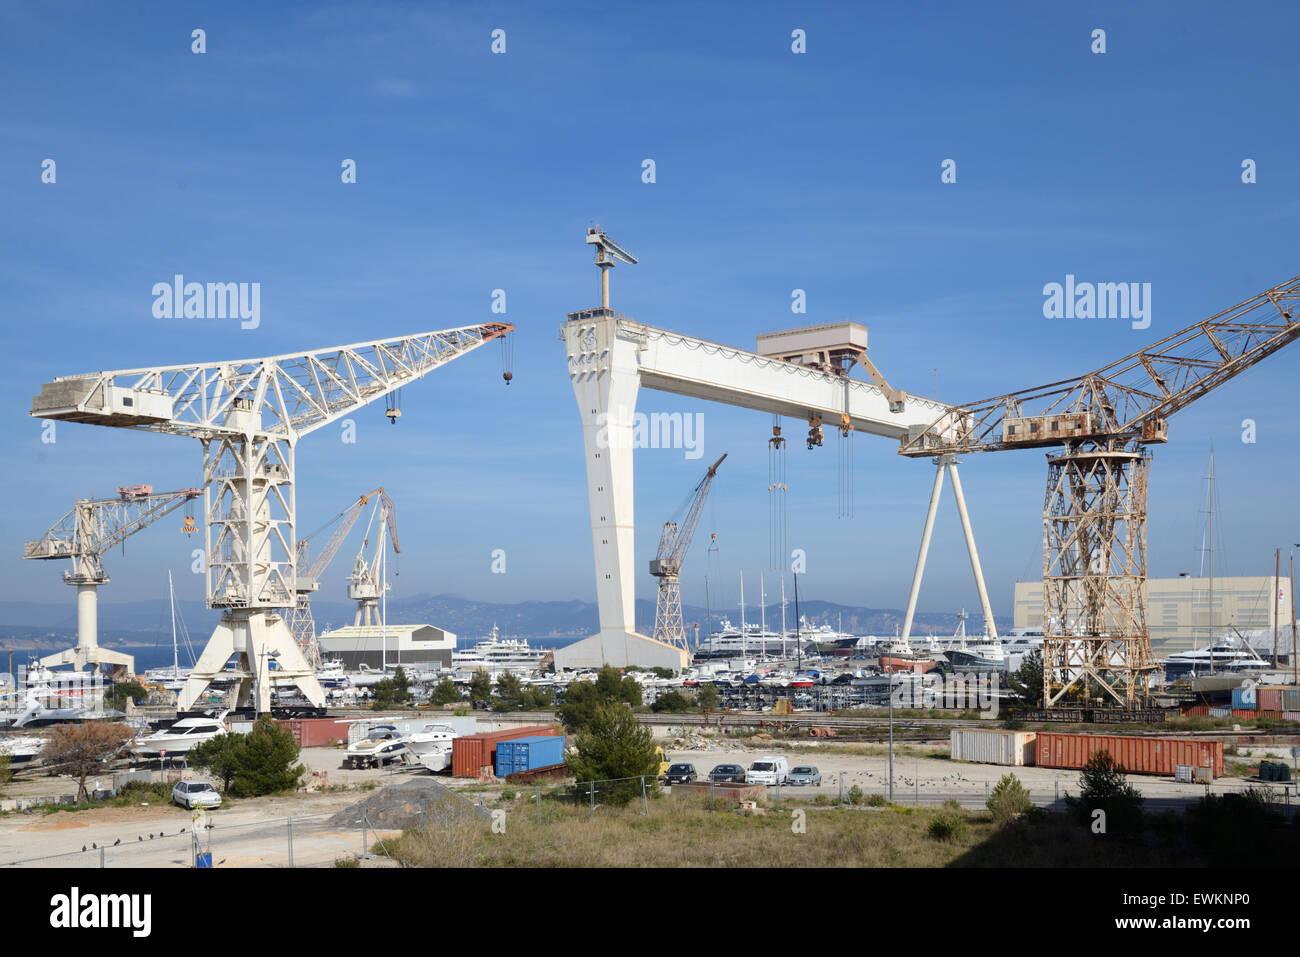 Giant Cranes of the Chantier Naval Boatyard or Shipyard at La Ciotat Provence France - Stock Image